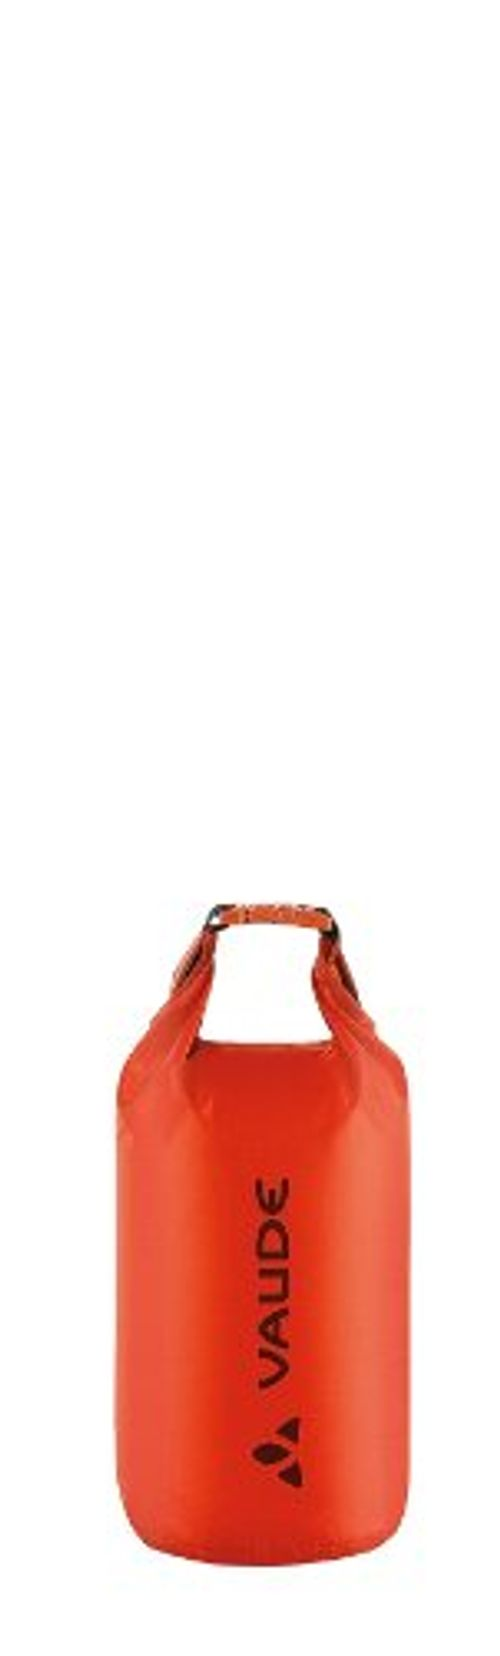 photo Wallpaper of Vaude-VAUDE Packsack Drybag Cordura Light, 2 Liter, Orange, 30293-Orange